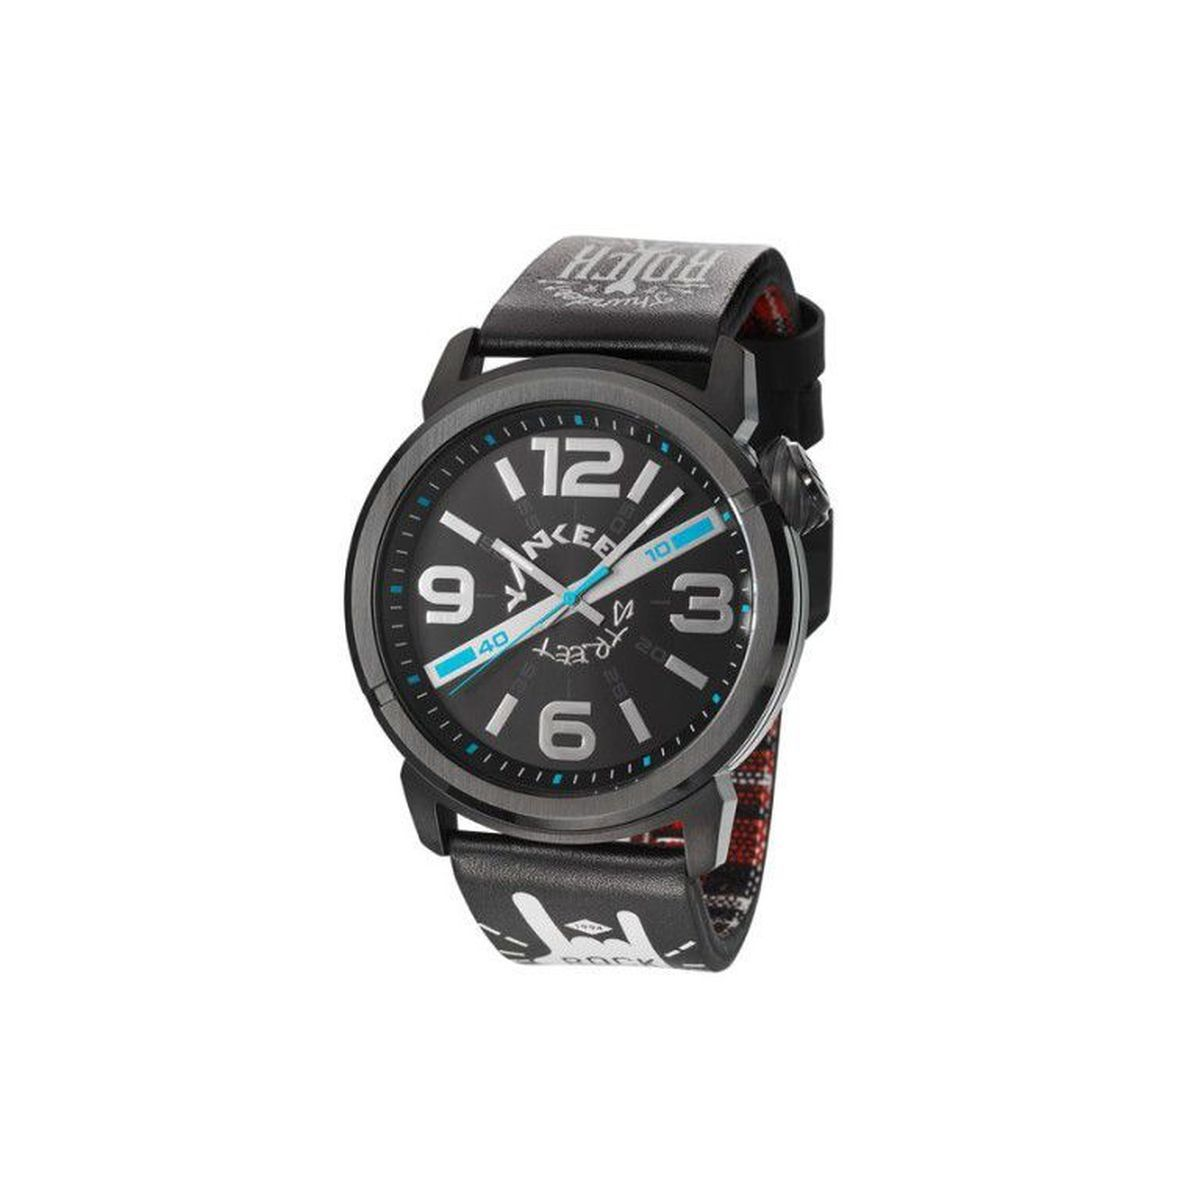 Relógio de Pulso Masculino Black Angels YS30425P